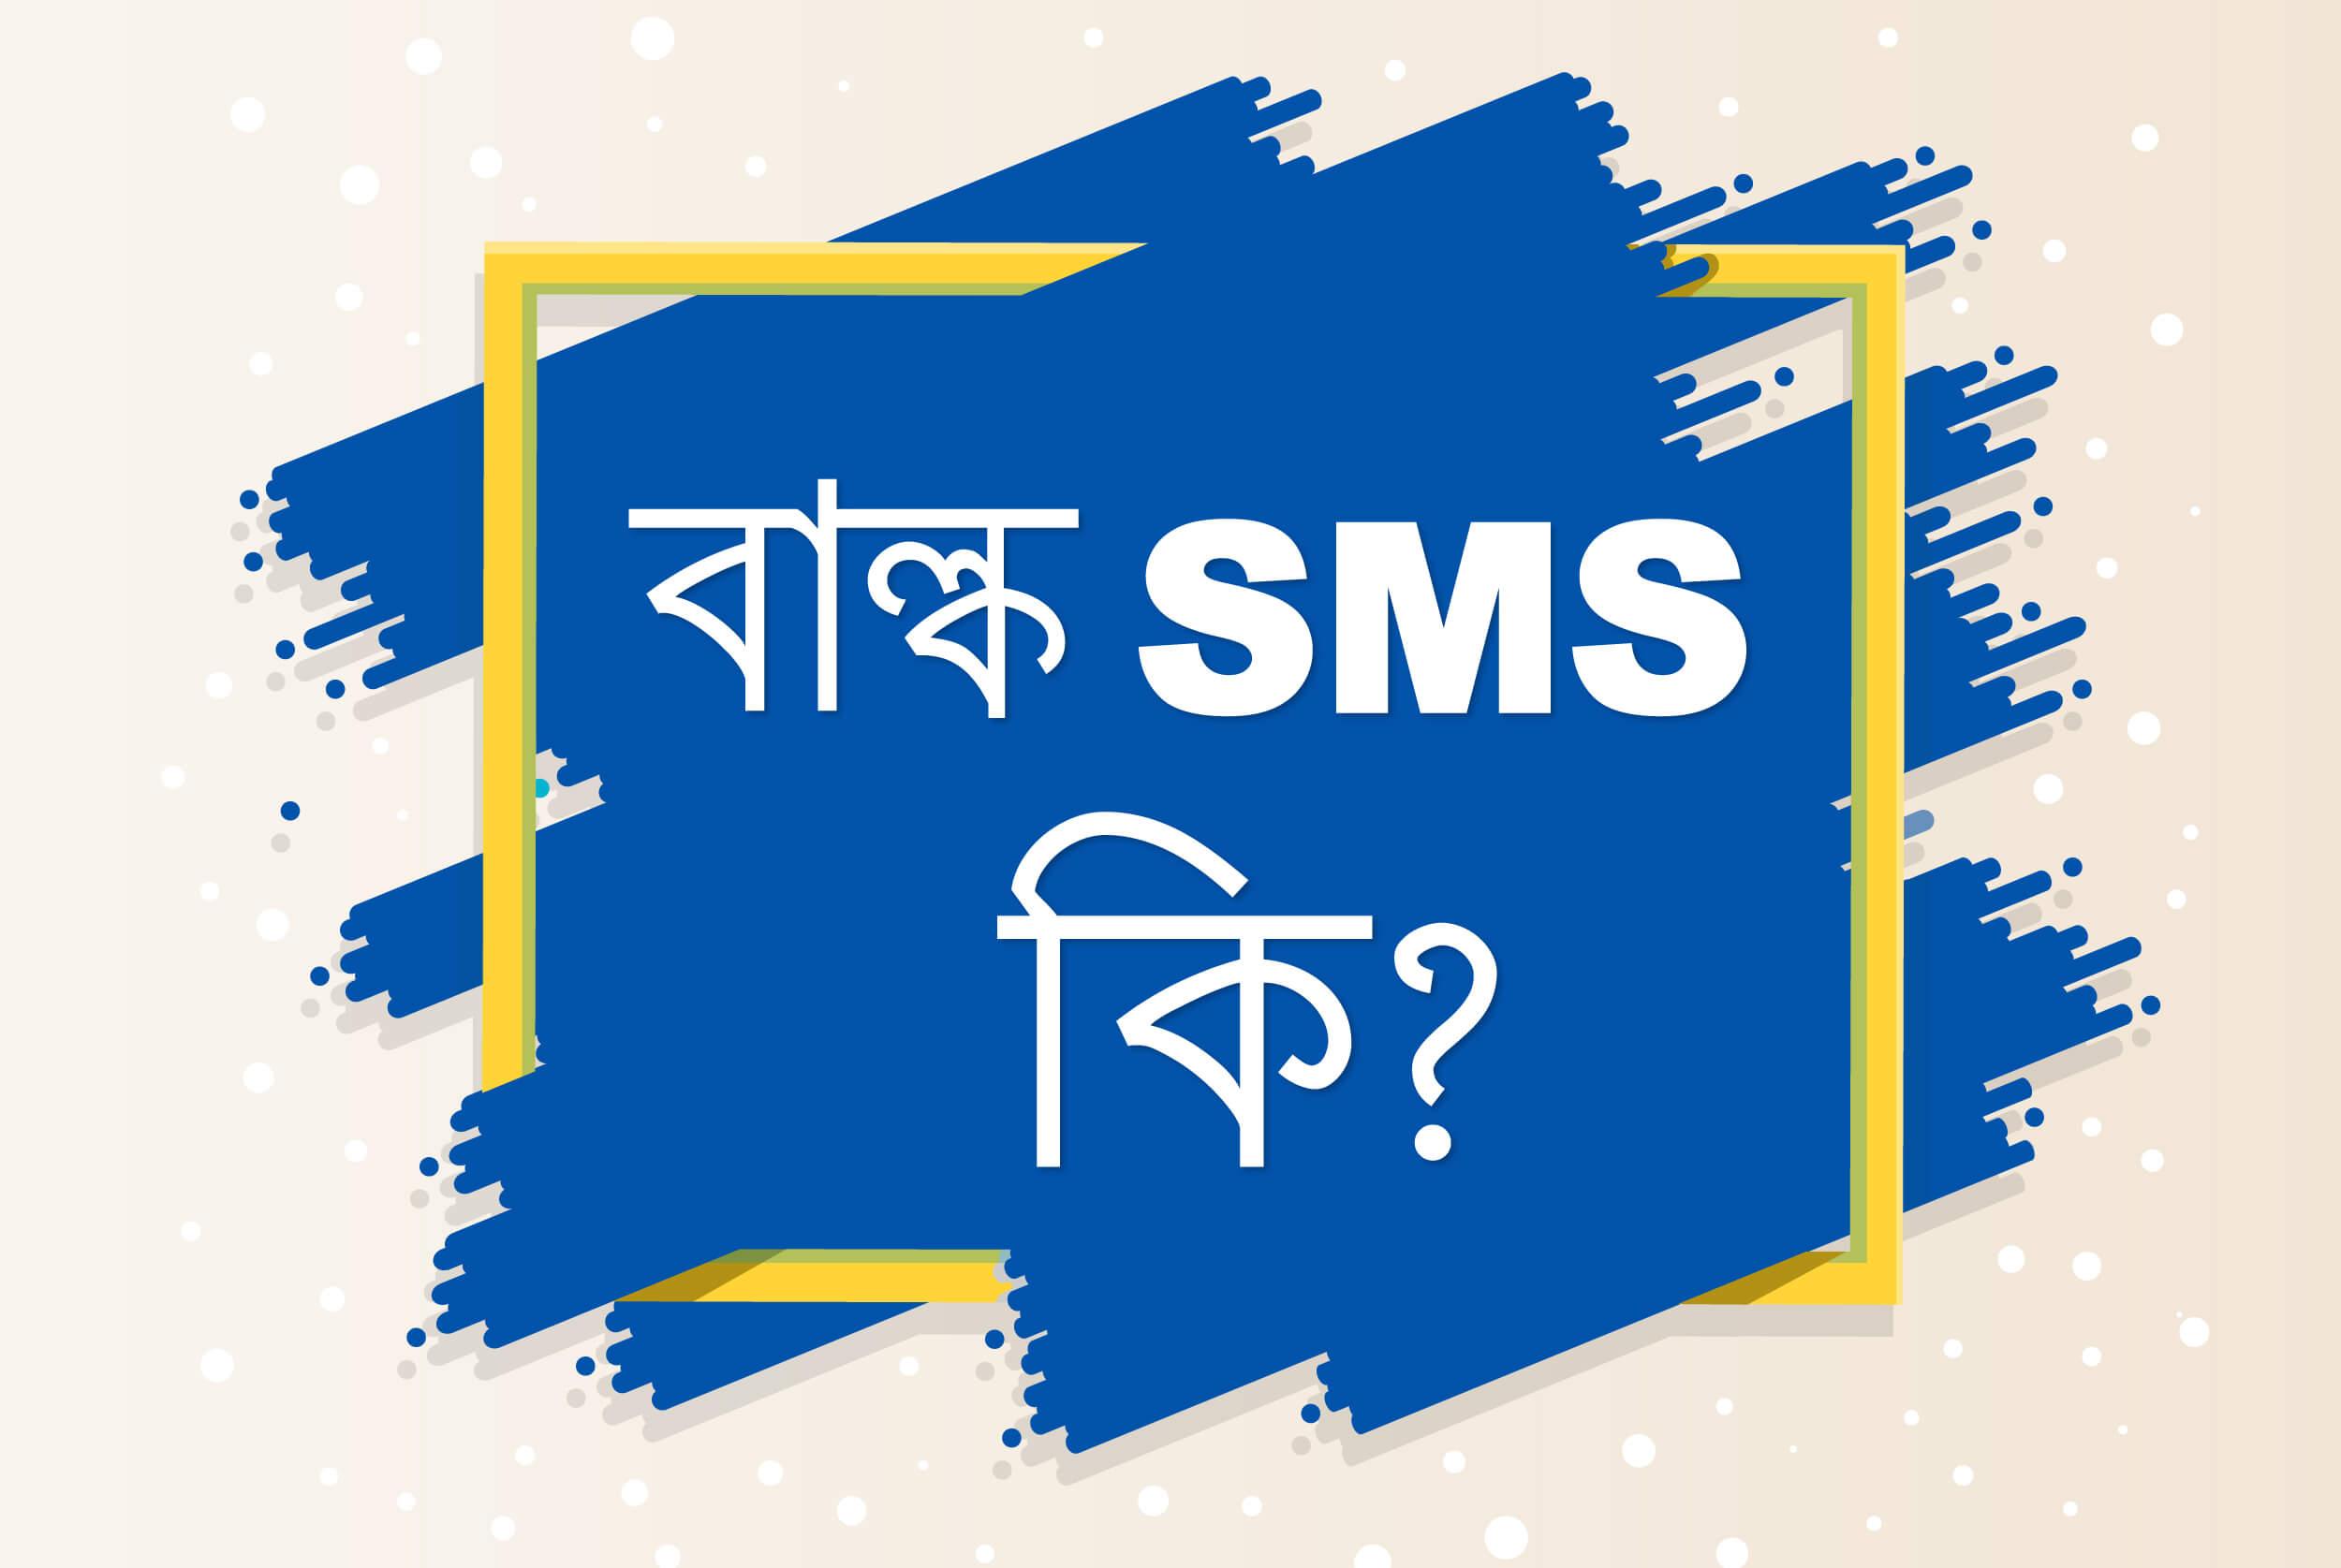 Bulk SMS কি? এবং কিভাবে SMS মার্কেটিং করবেন?